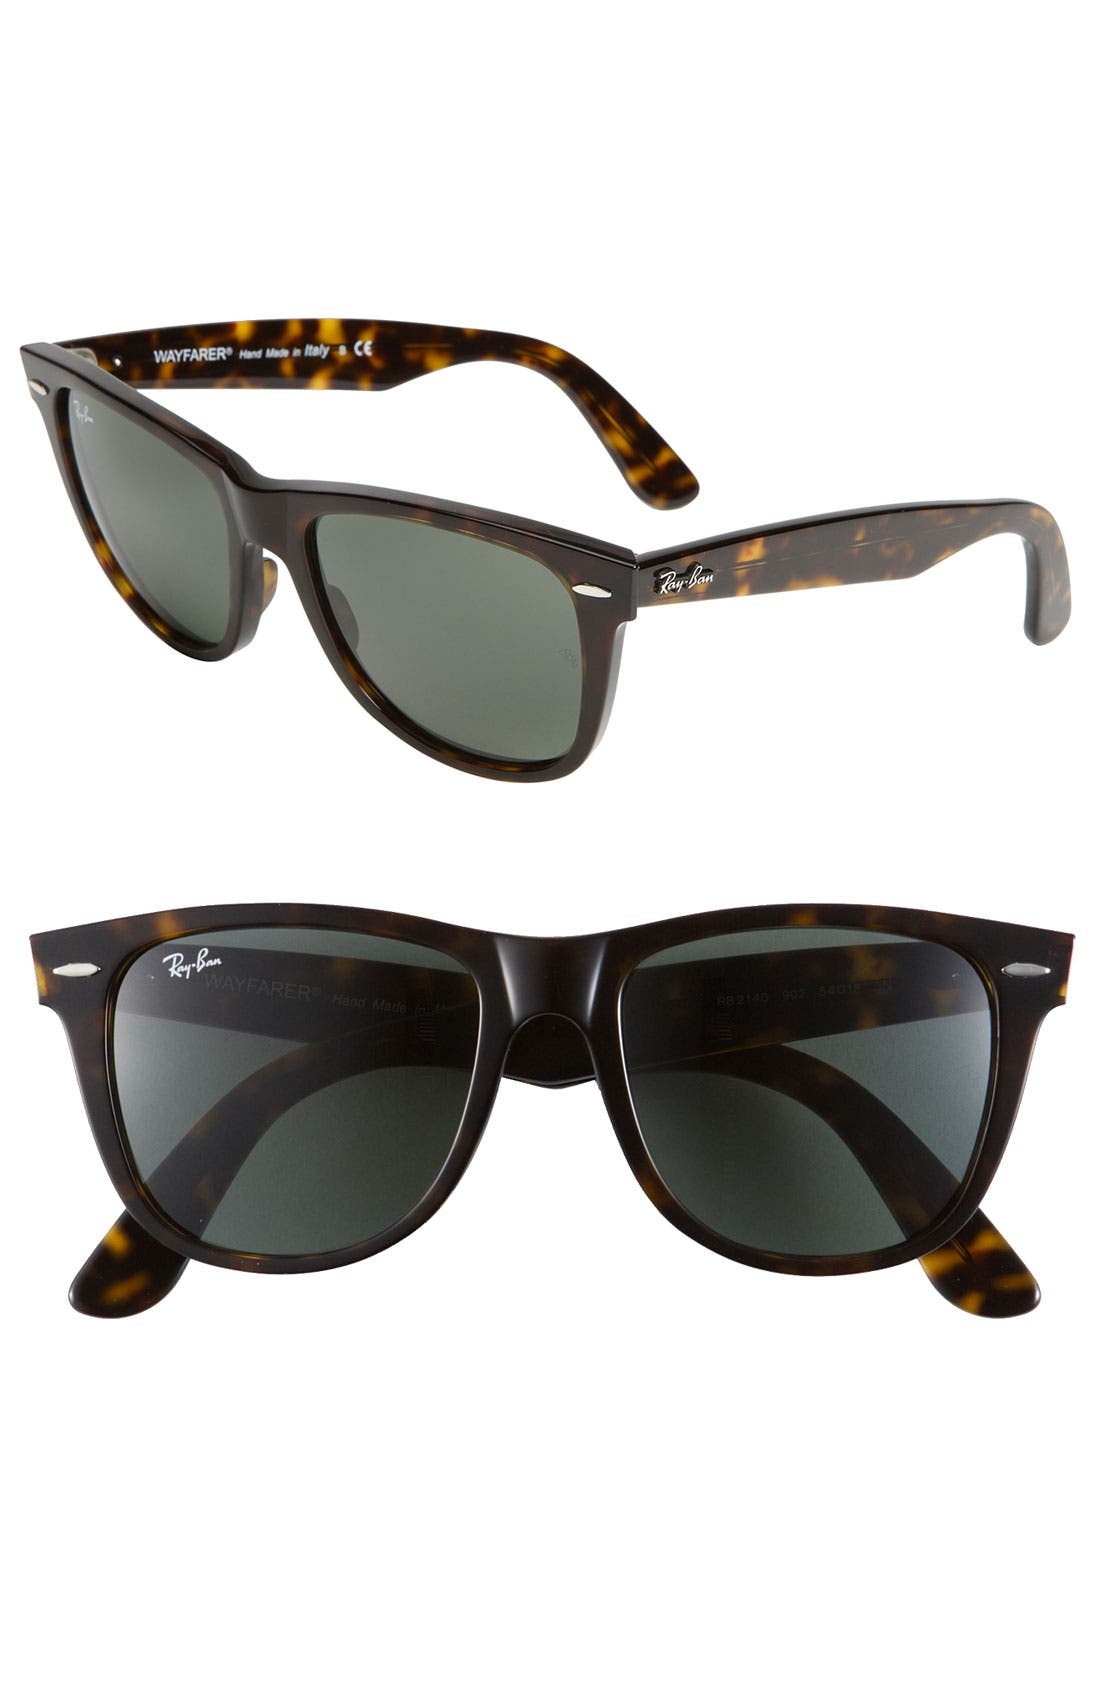 Main Image - Ray-Ban Large Classic Wayfarer 54mm Sunglasses